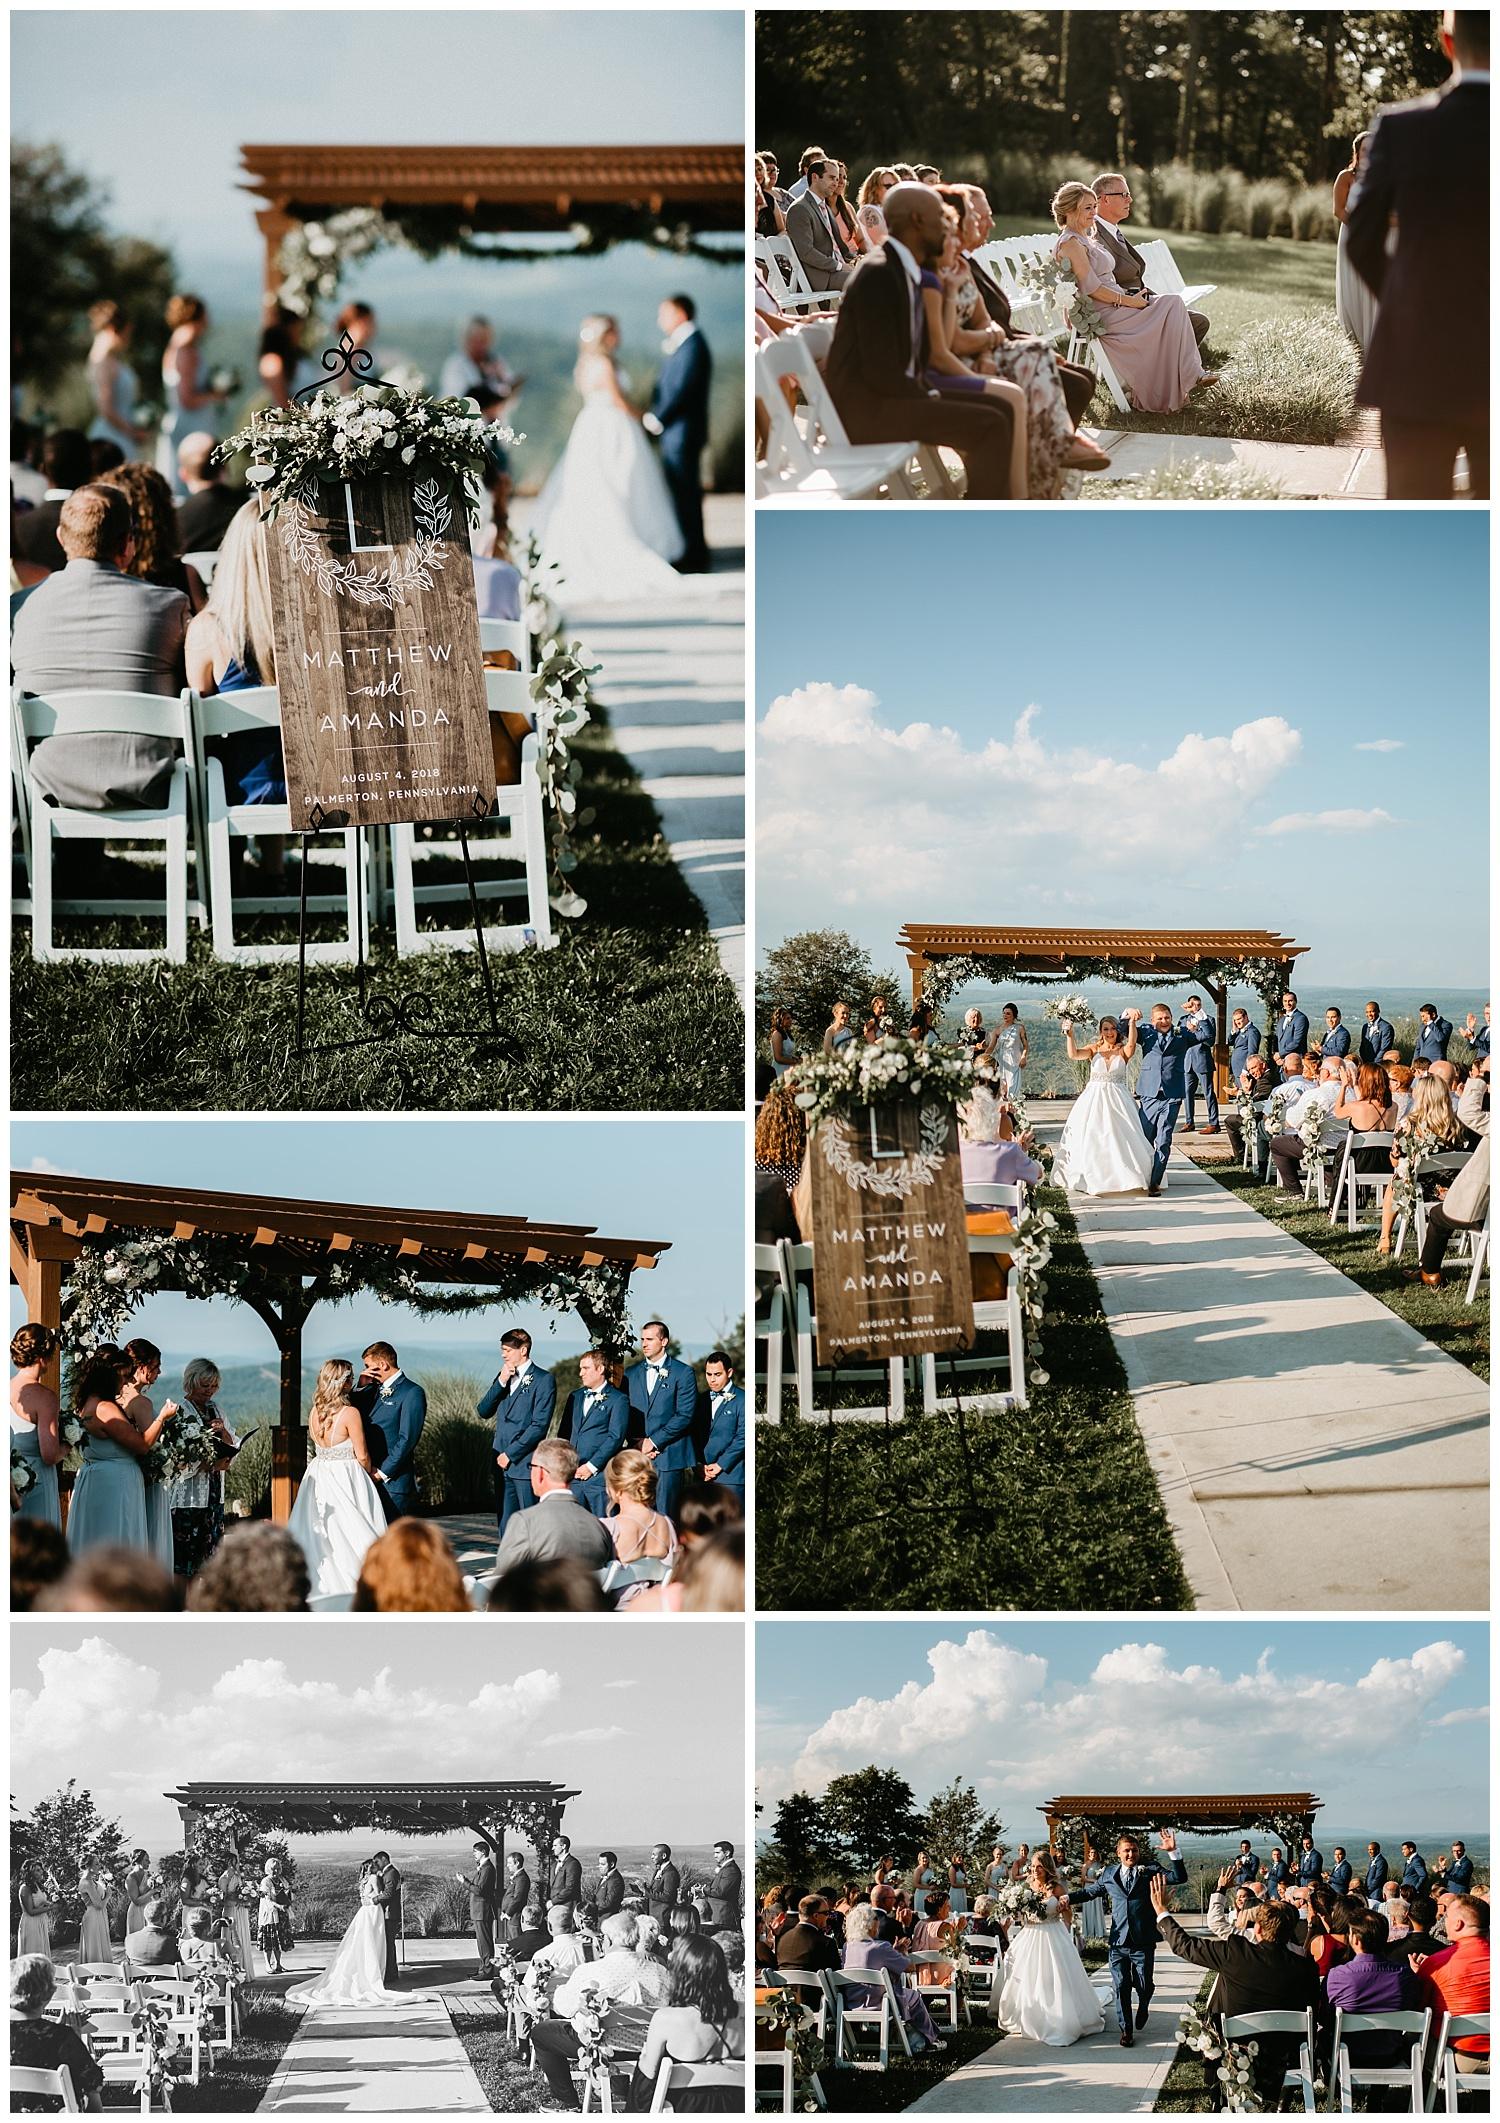 Destination-Wedding-Photographer-in-NEPA-Palmerton-PA_0021.jpg